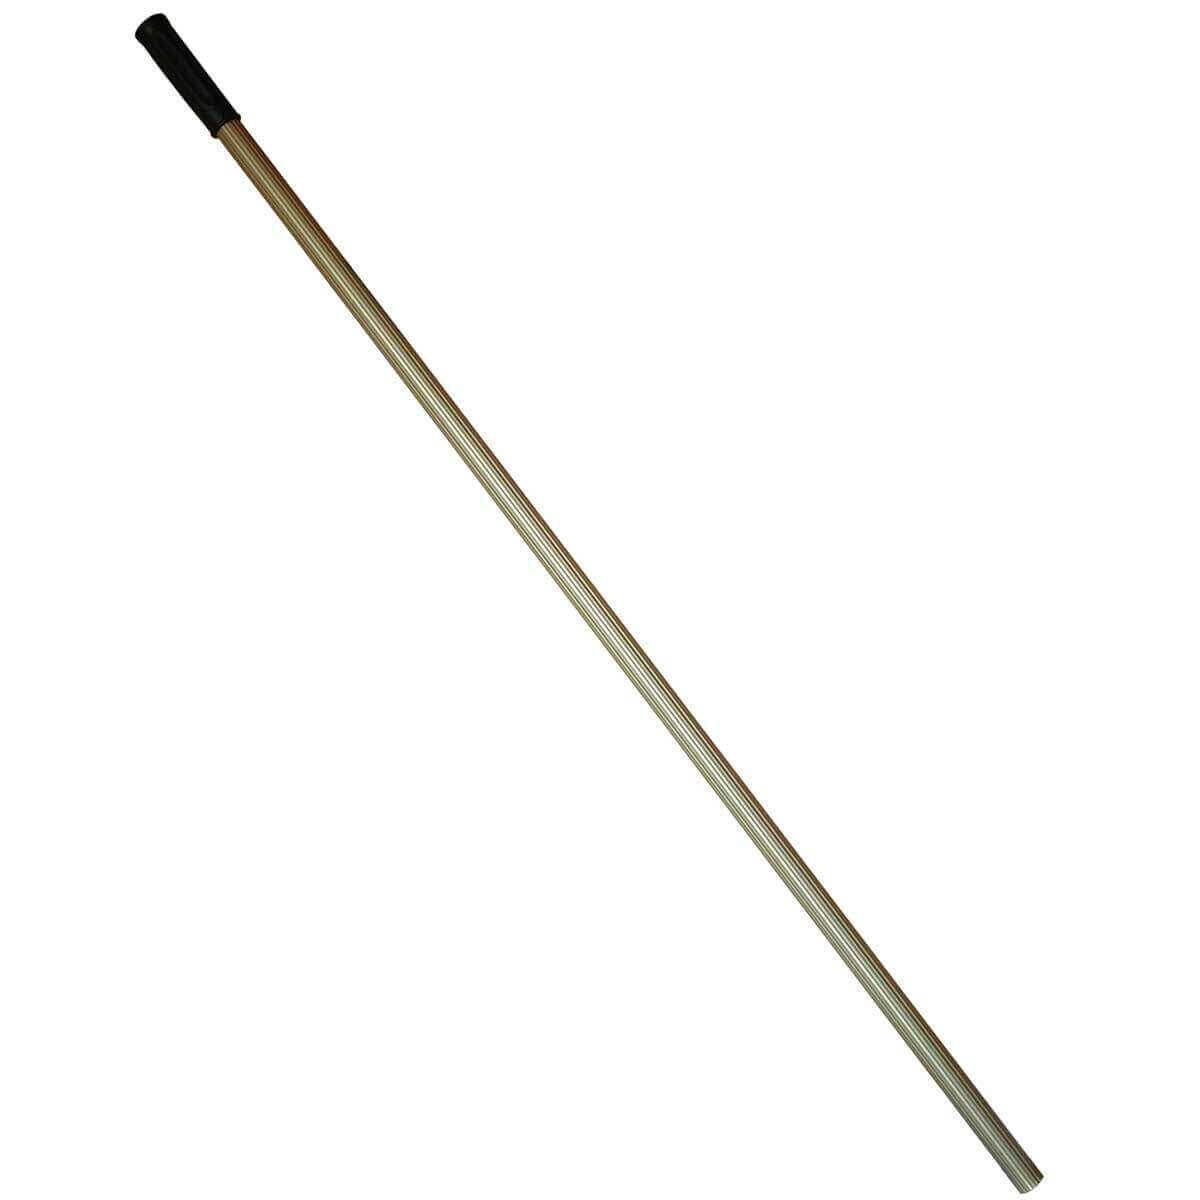 Raimondi Grout Sponge Pole